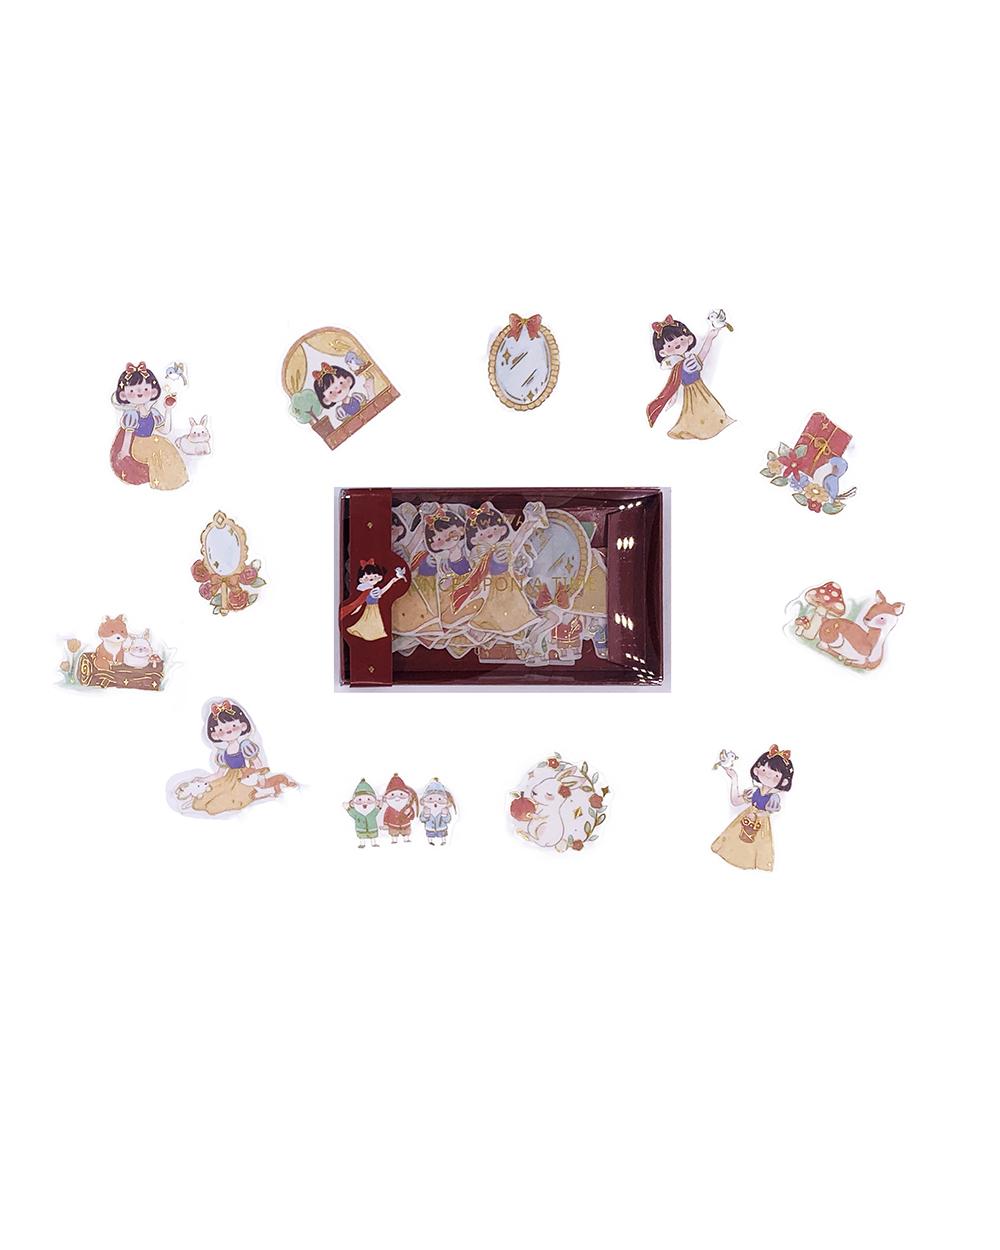 Caixinha de adesivos Fairytale - Branca de Neve